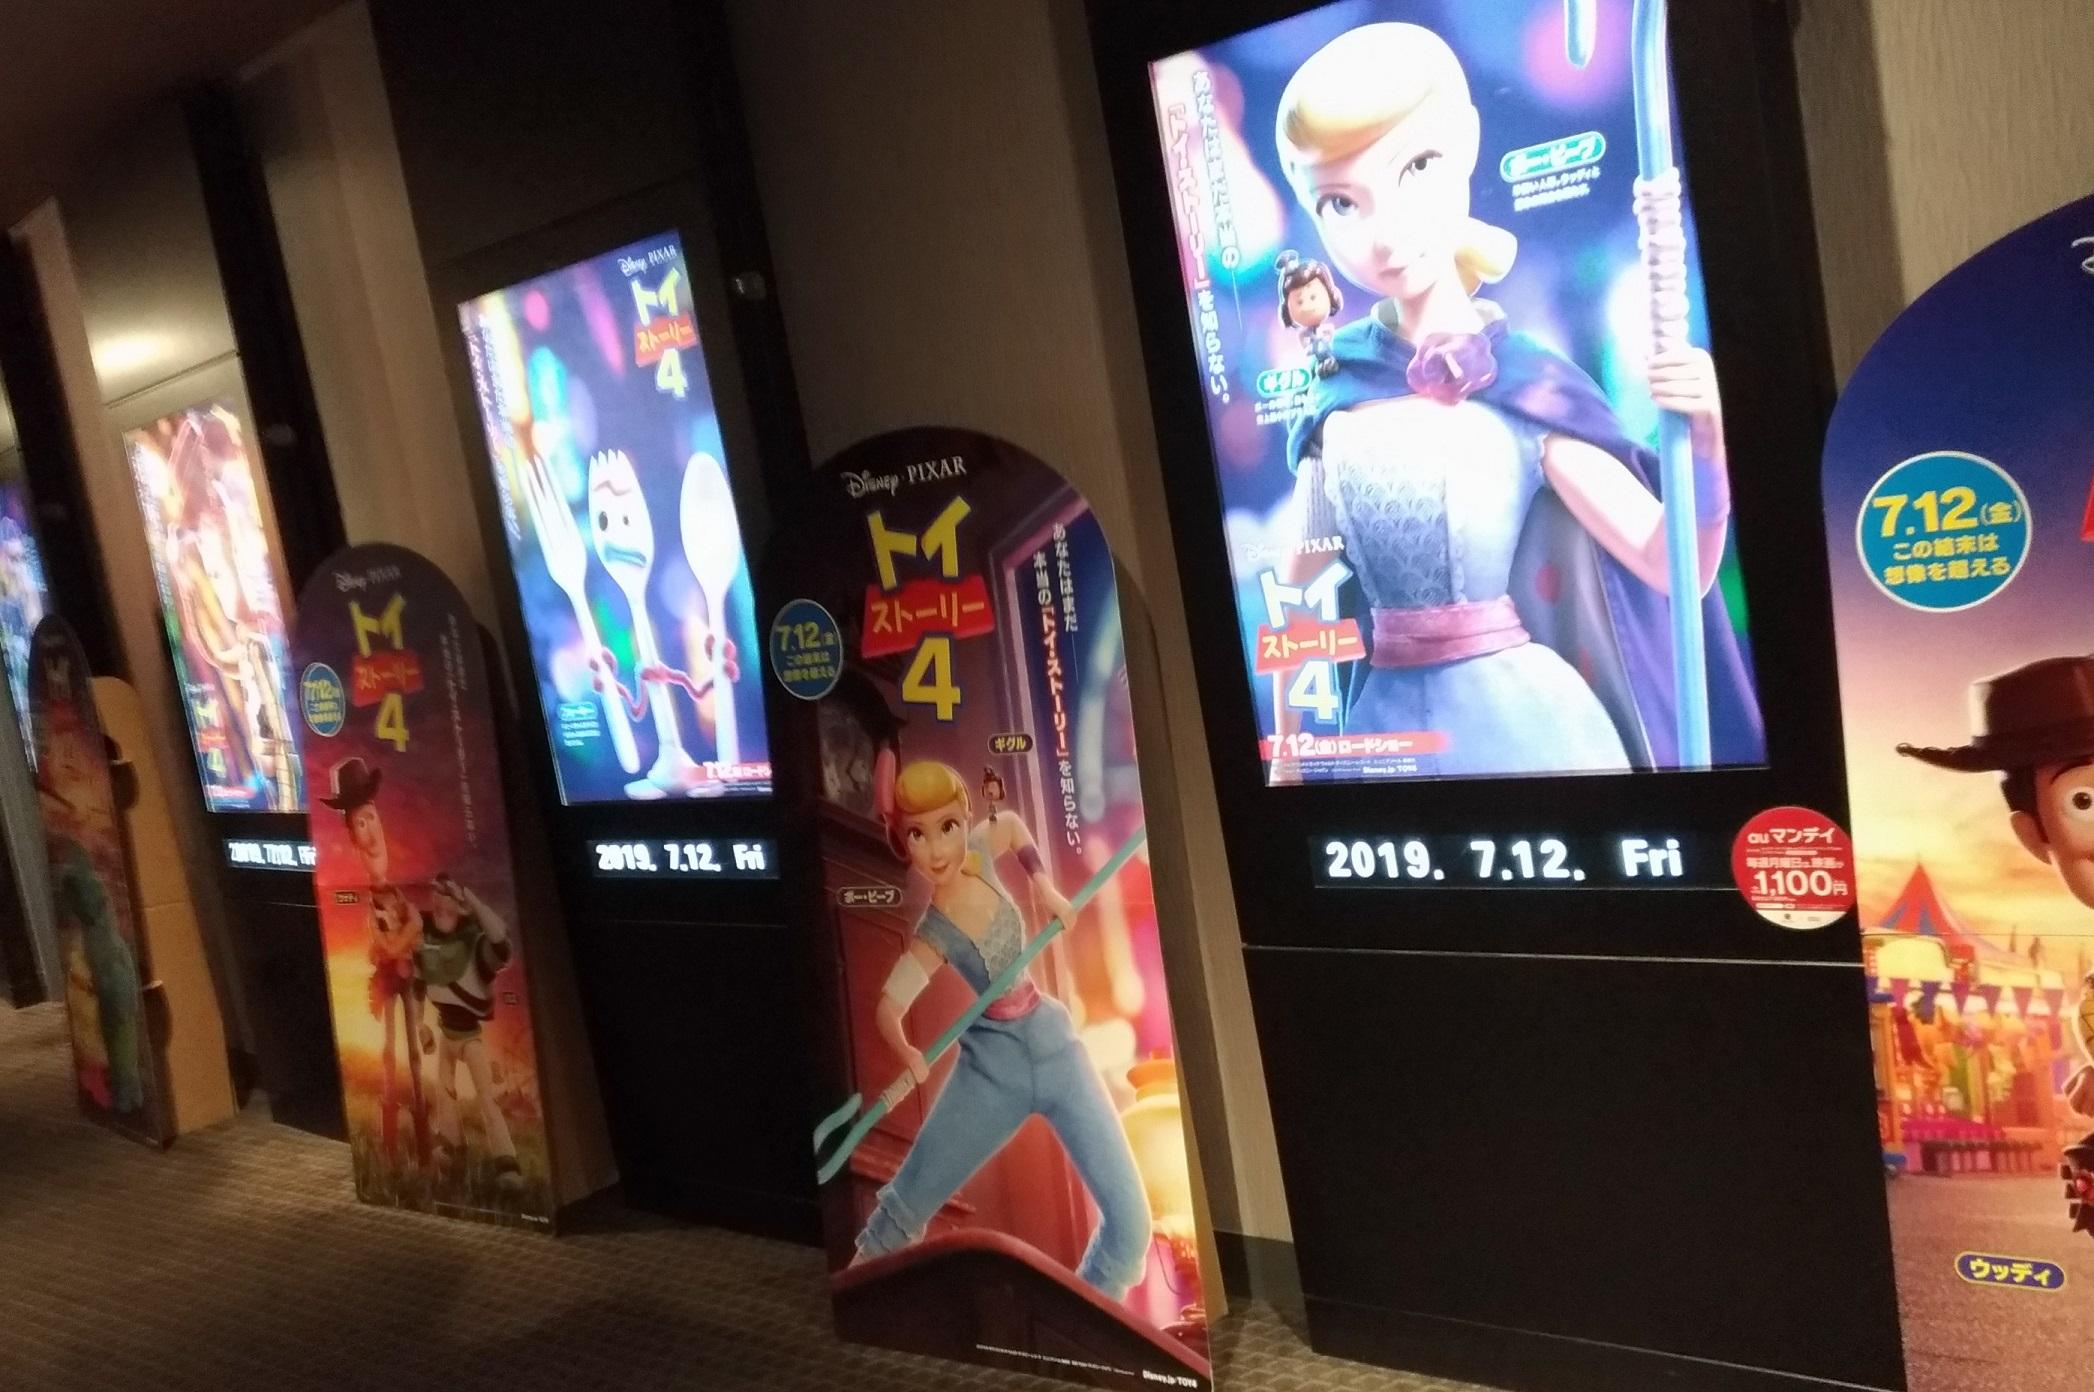 movies_osaka_toy_story4_1.jpg